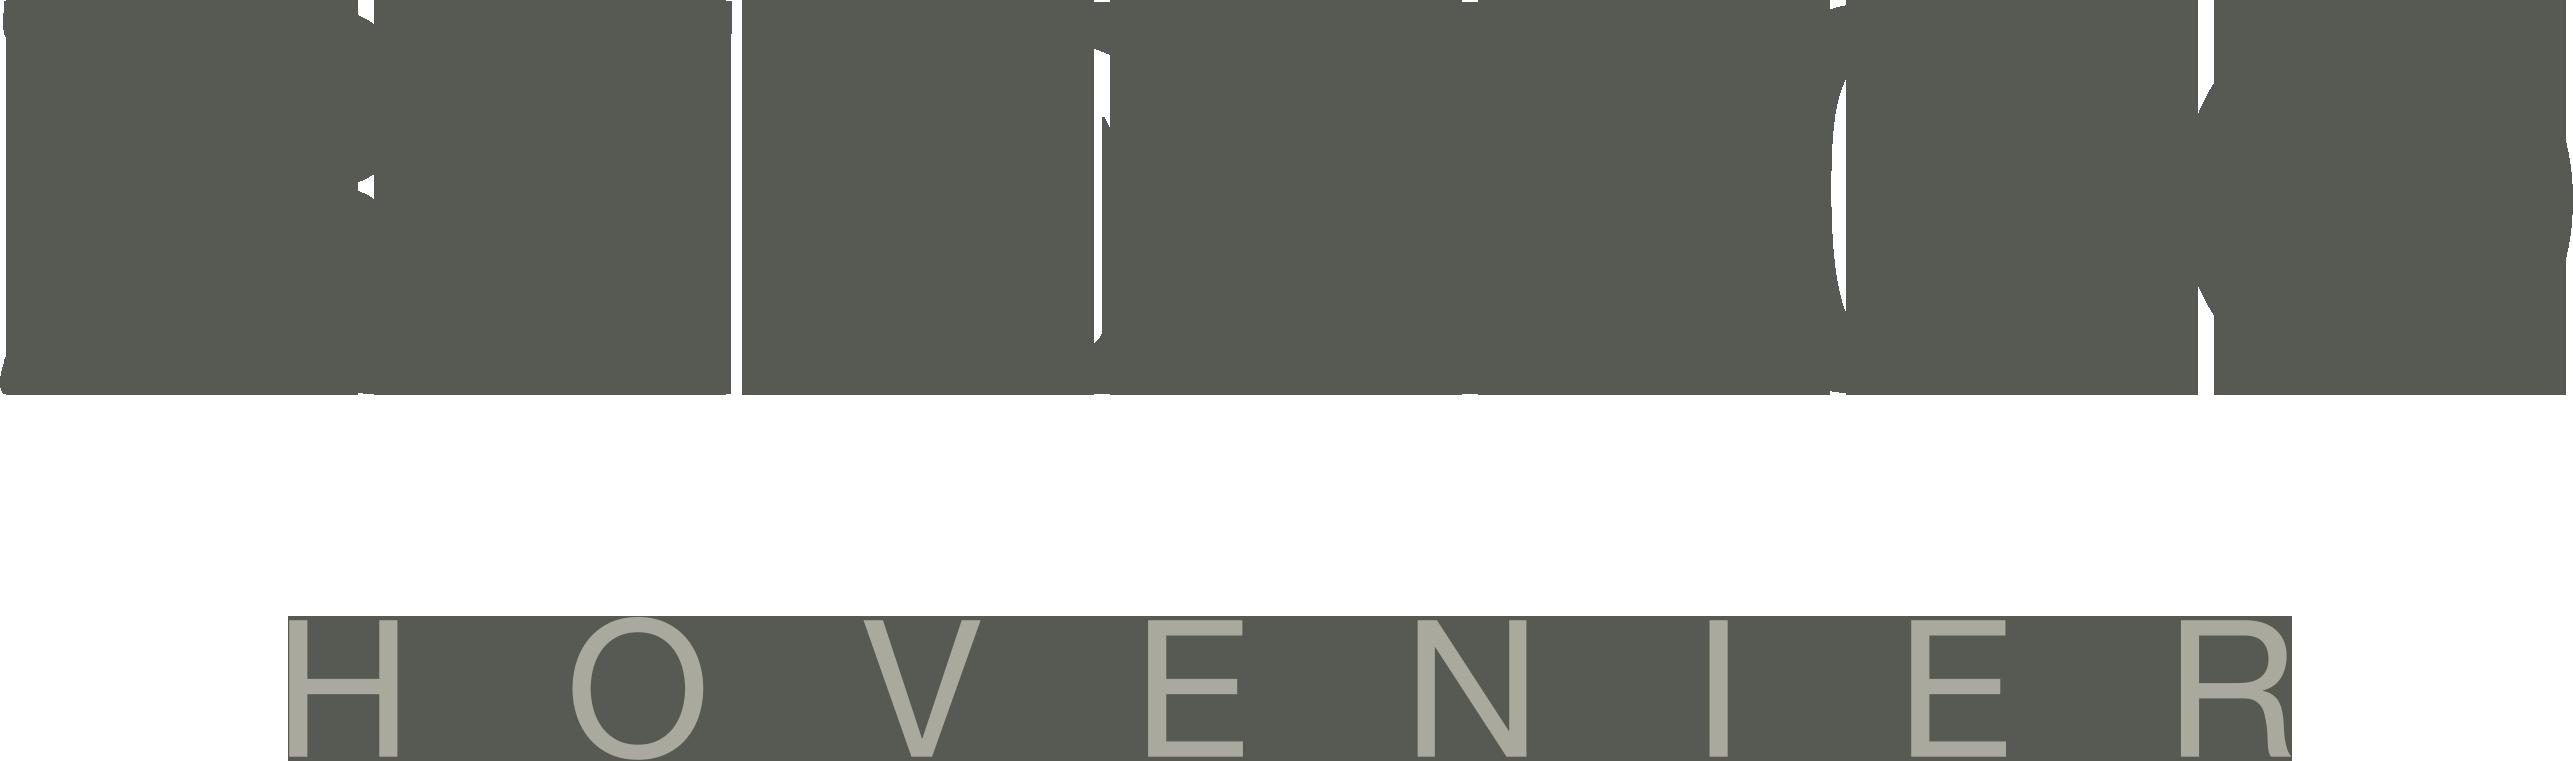 Remco Hofstee Hovenier Logo